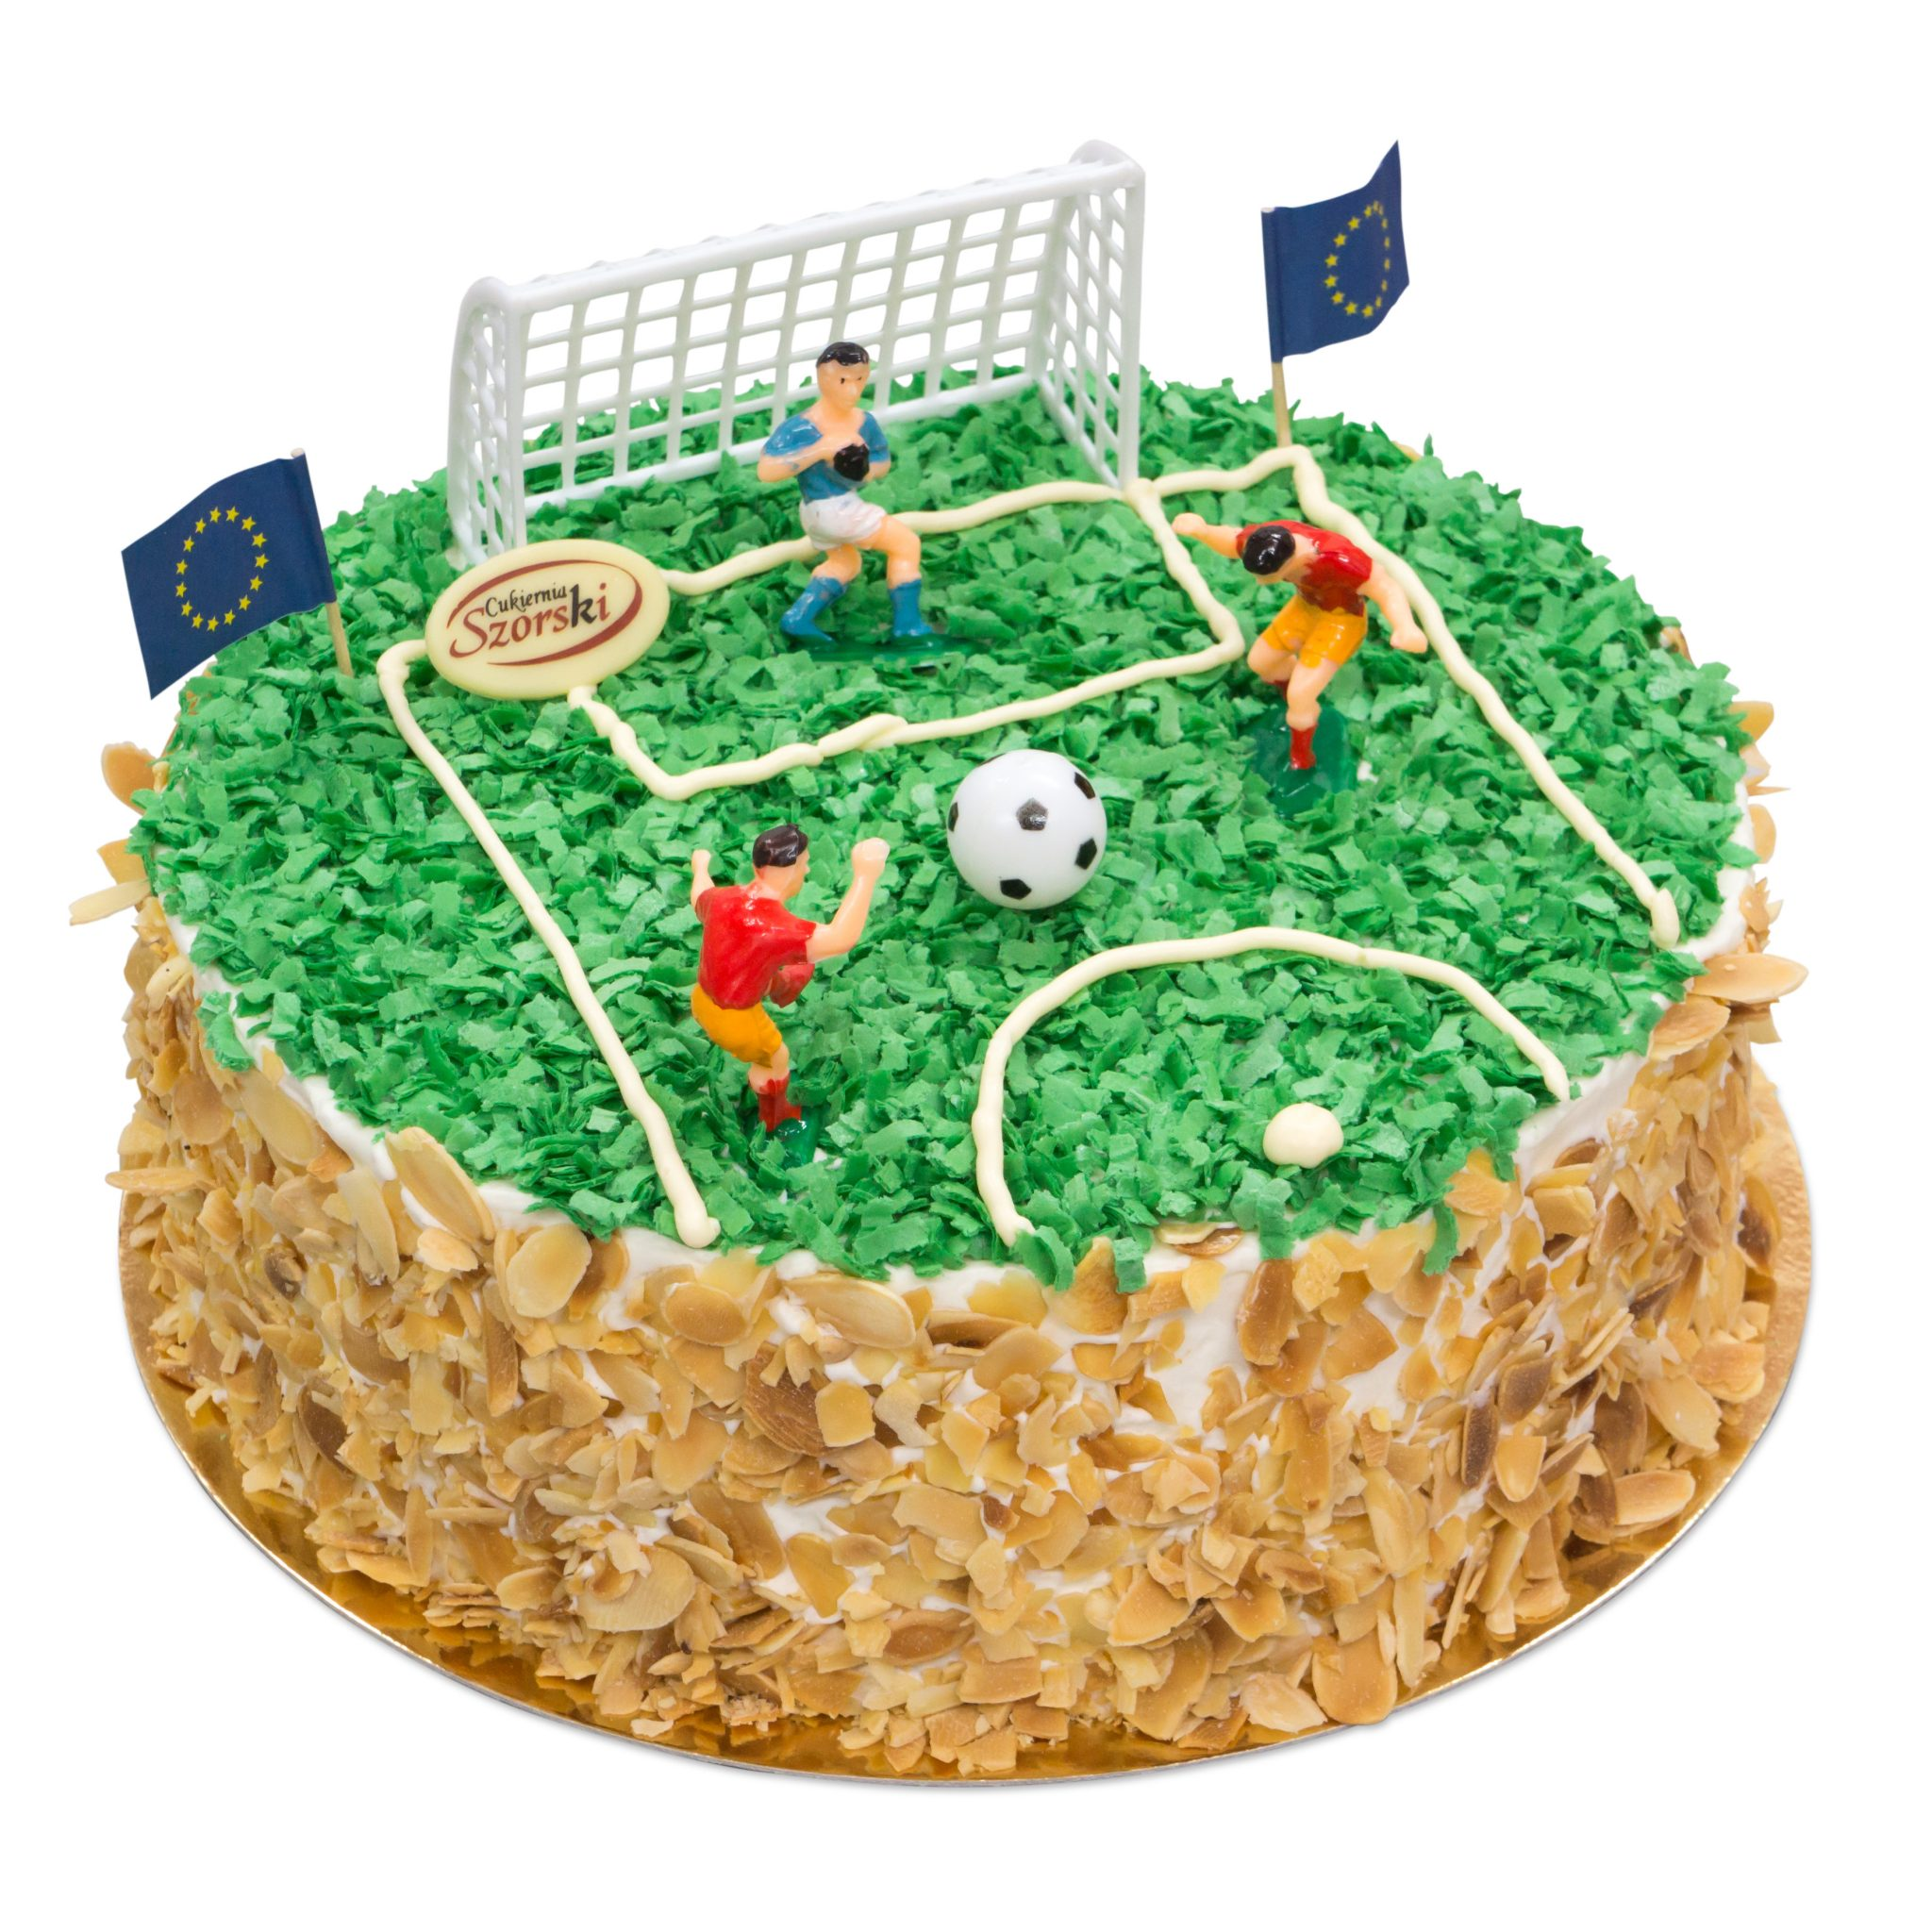 Tort boisko piłkarze